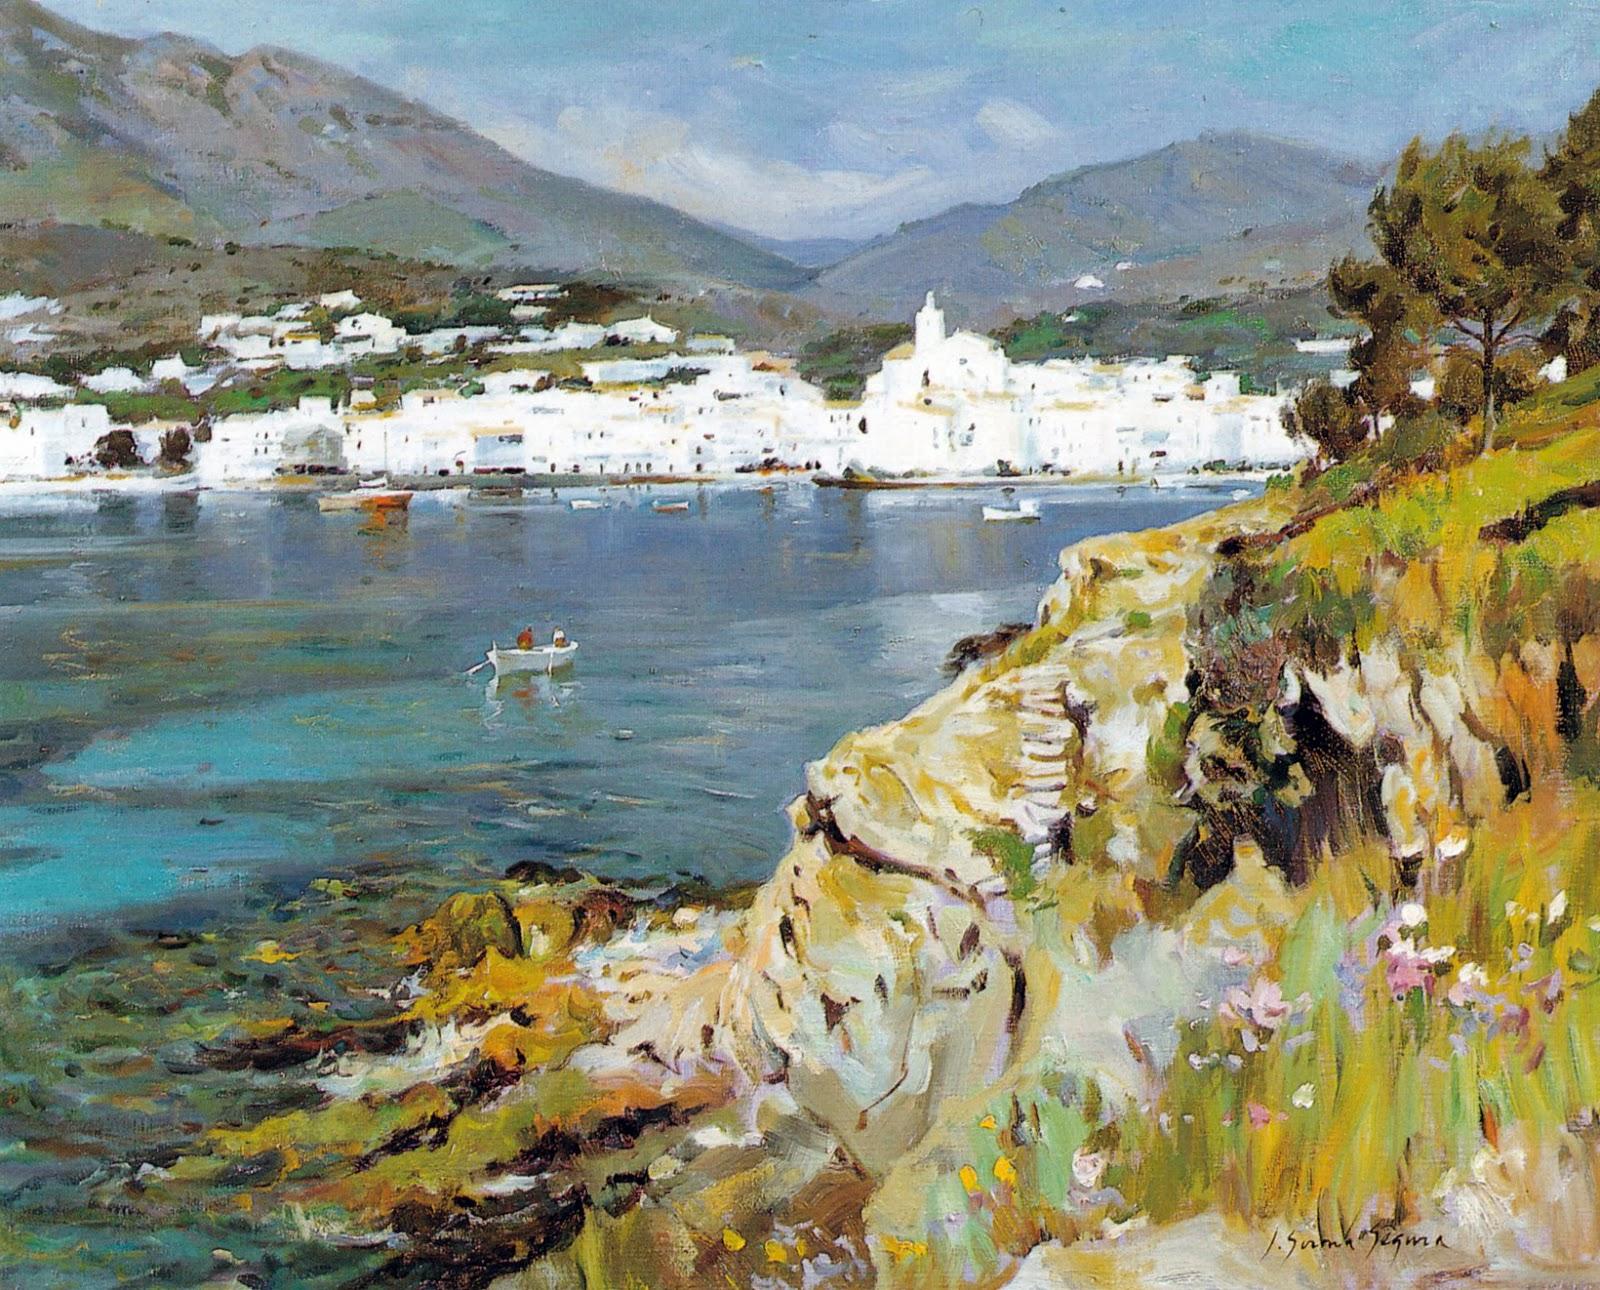 Paintings of cadaqu s josep girona segura - Pintores en girona ...